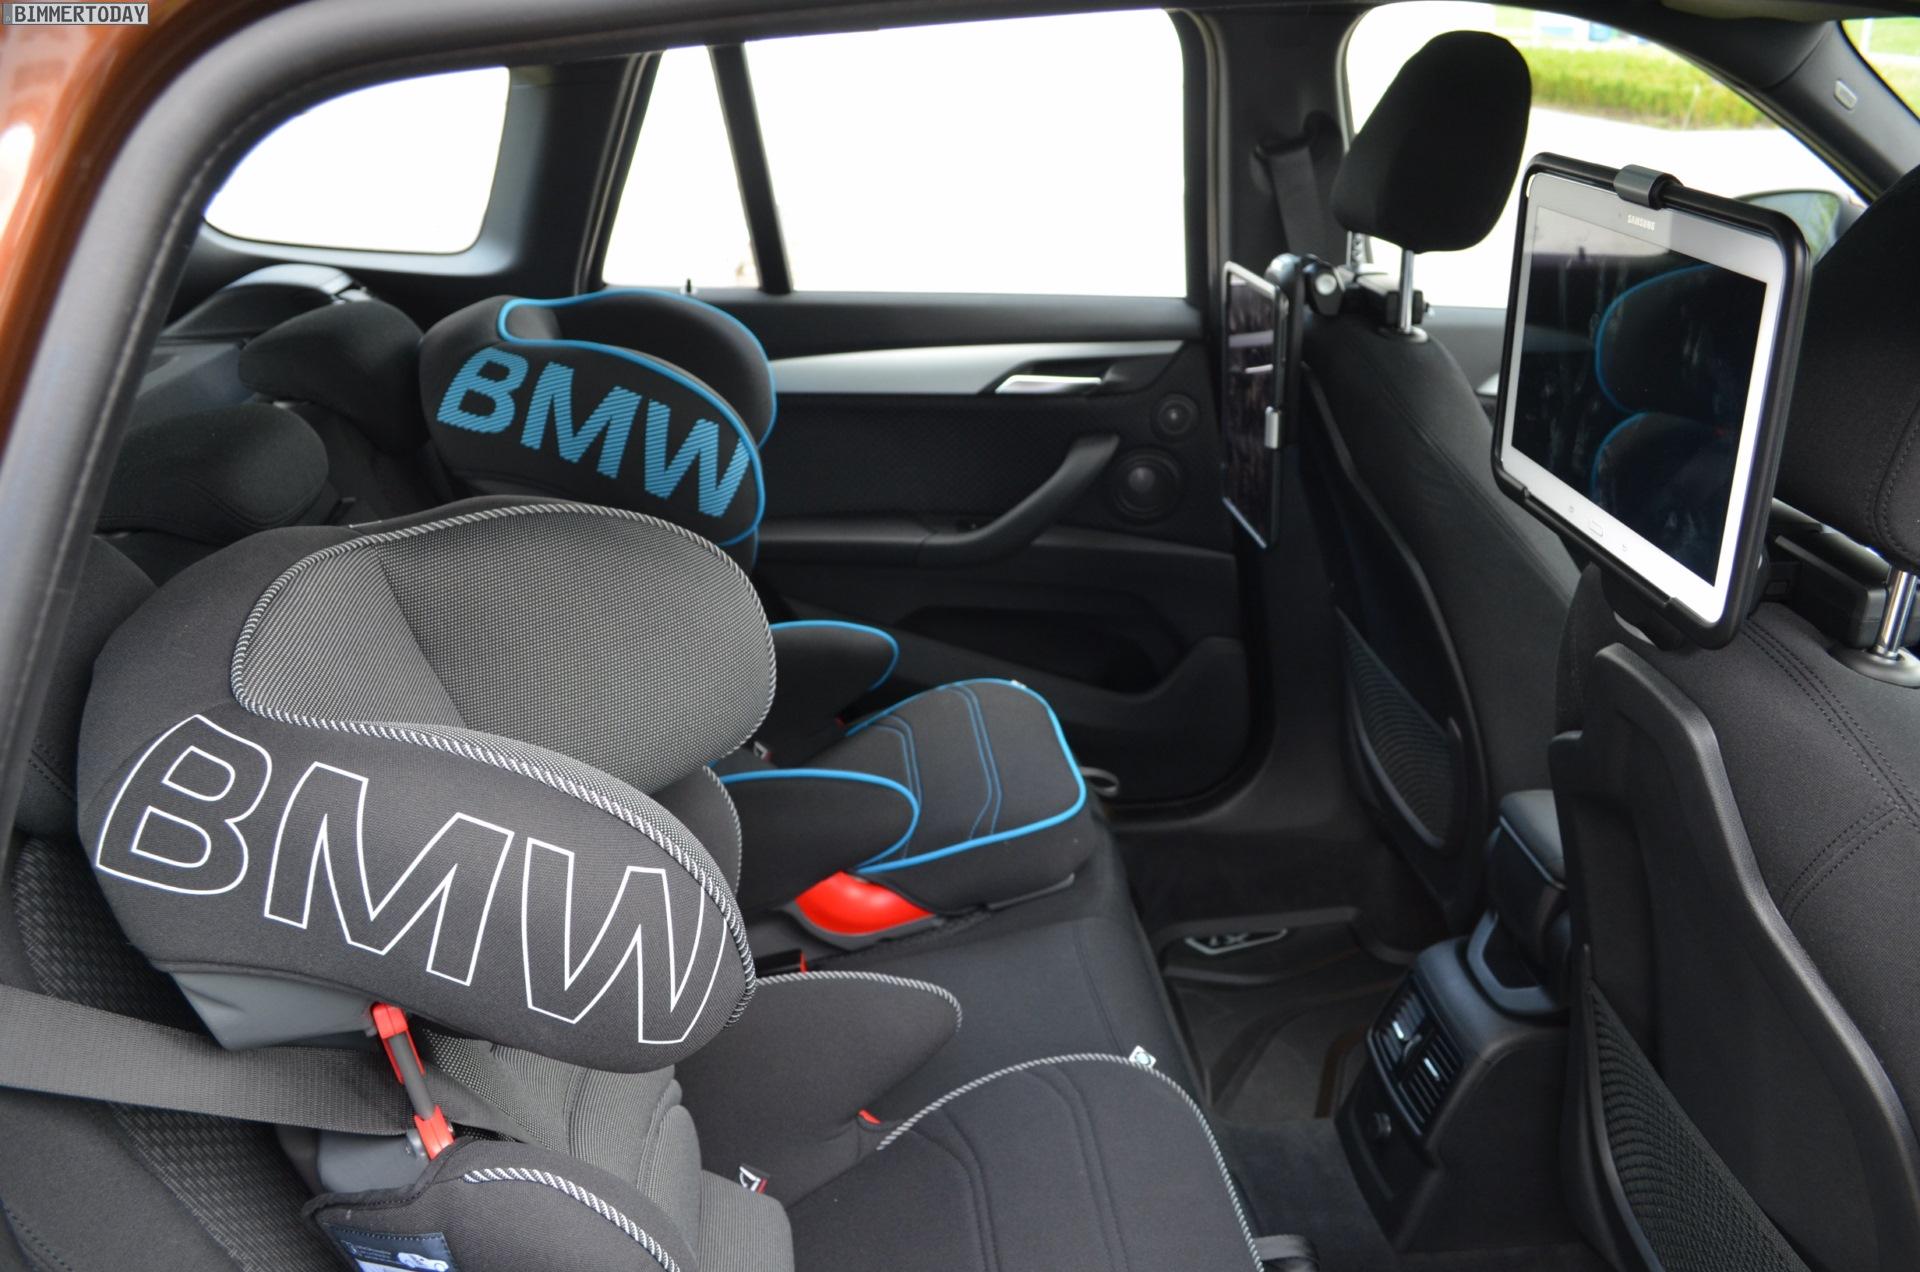 Bmw B47 Review BMW D Touring First Drive Bmw X1 Sdrive18D Ide D